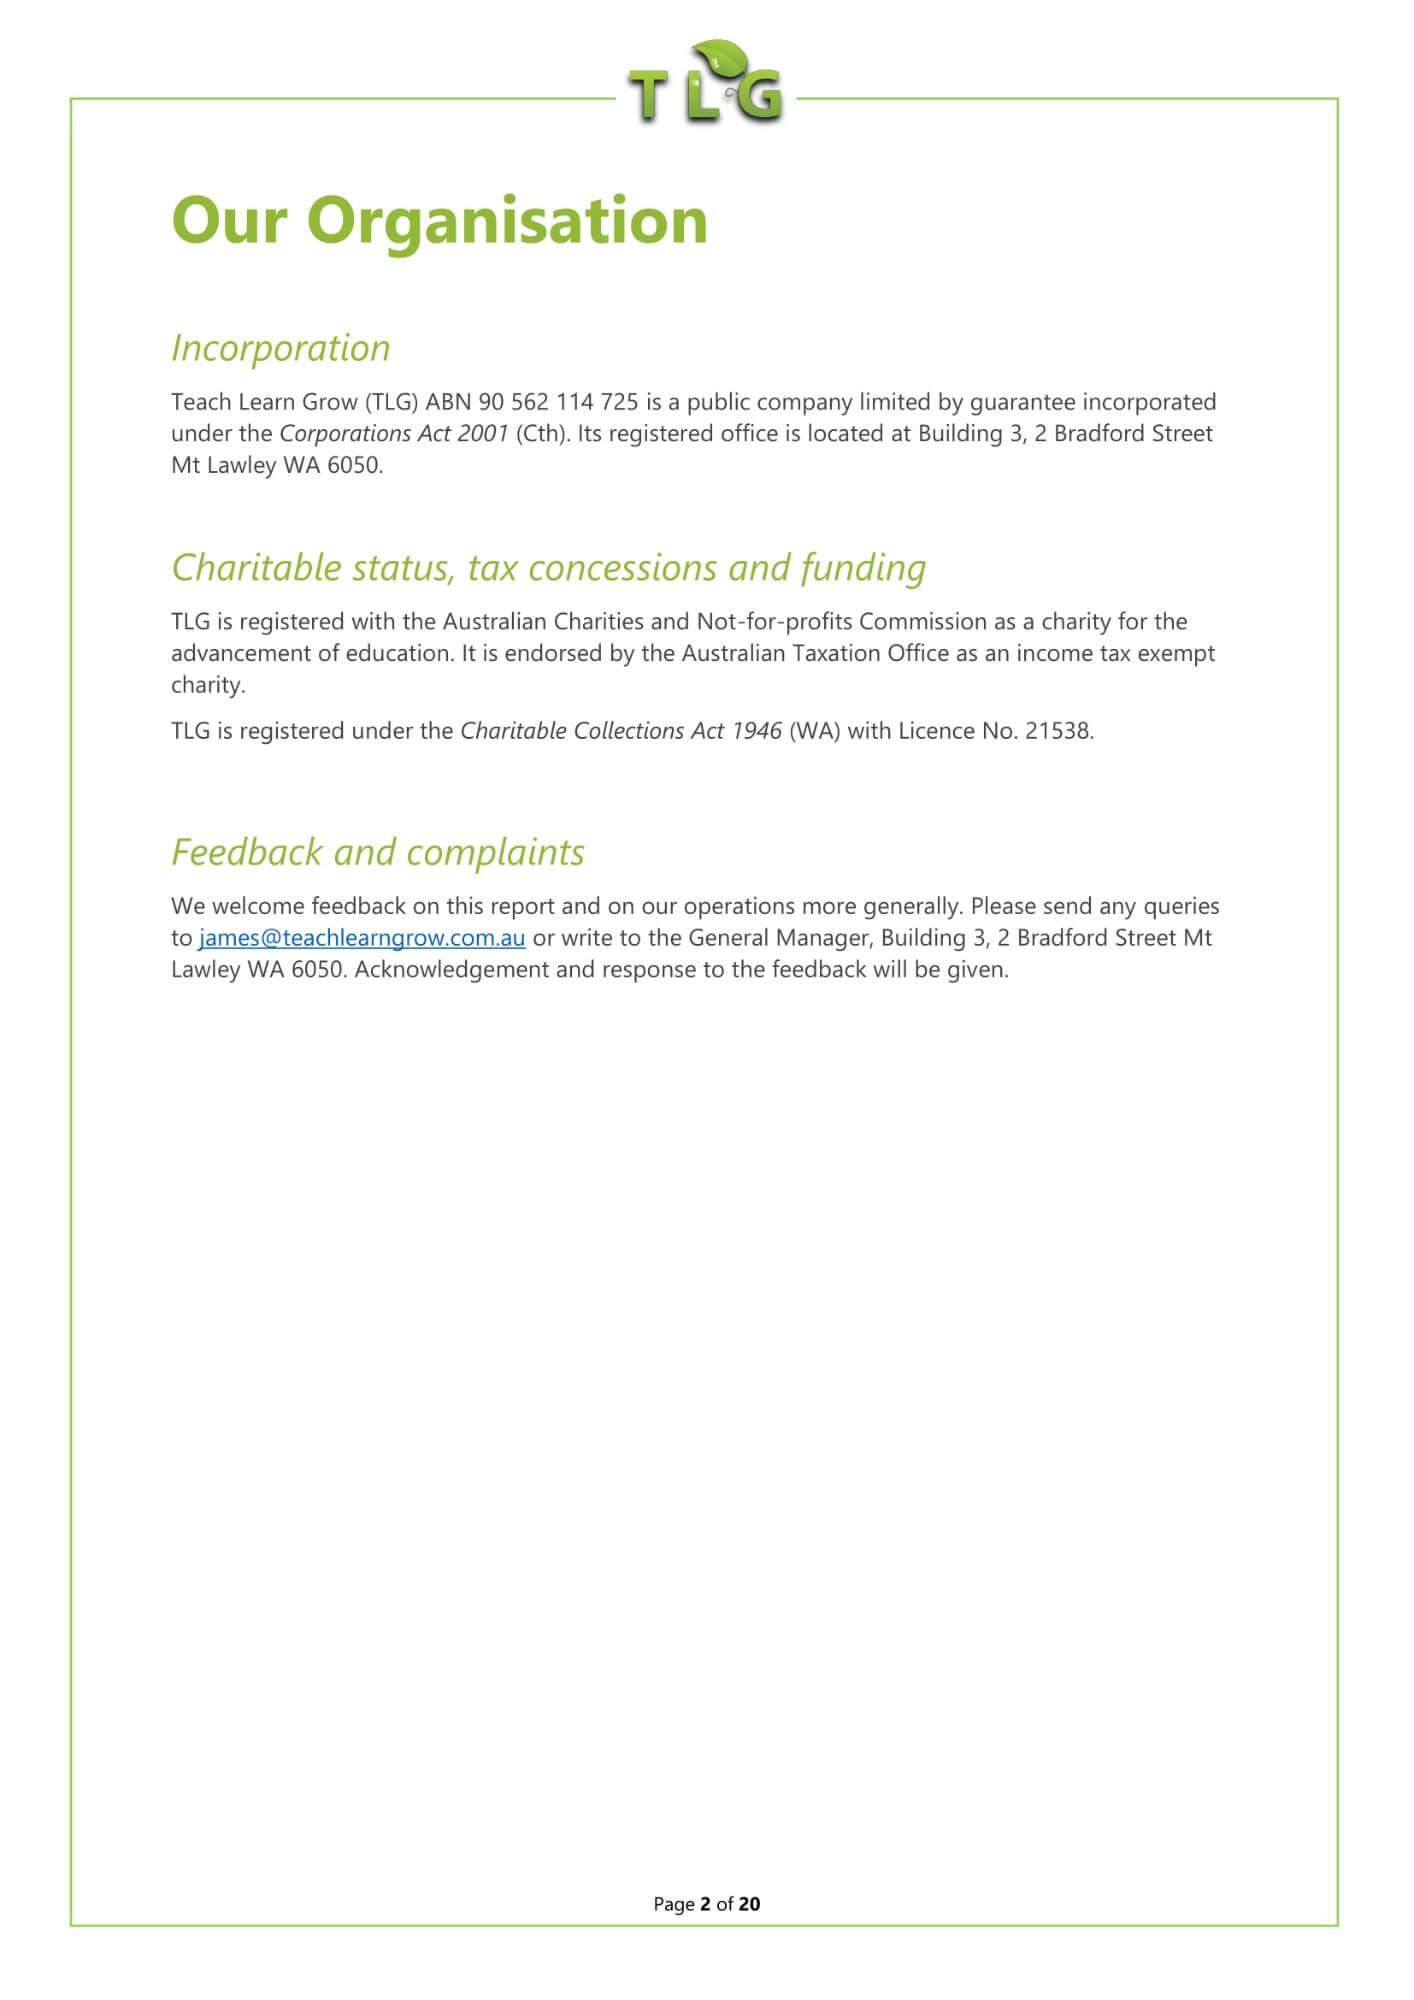 tlg-annual-report-FY14-02.jpg